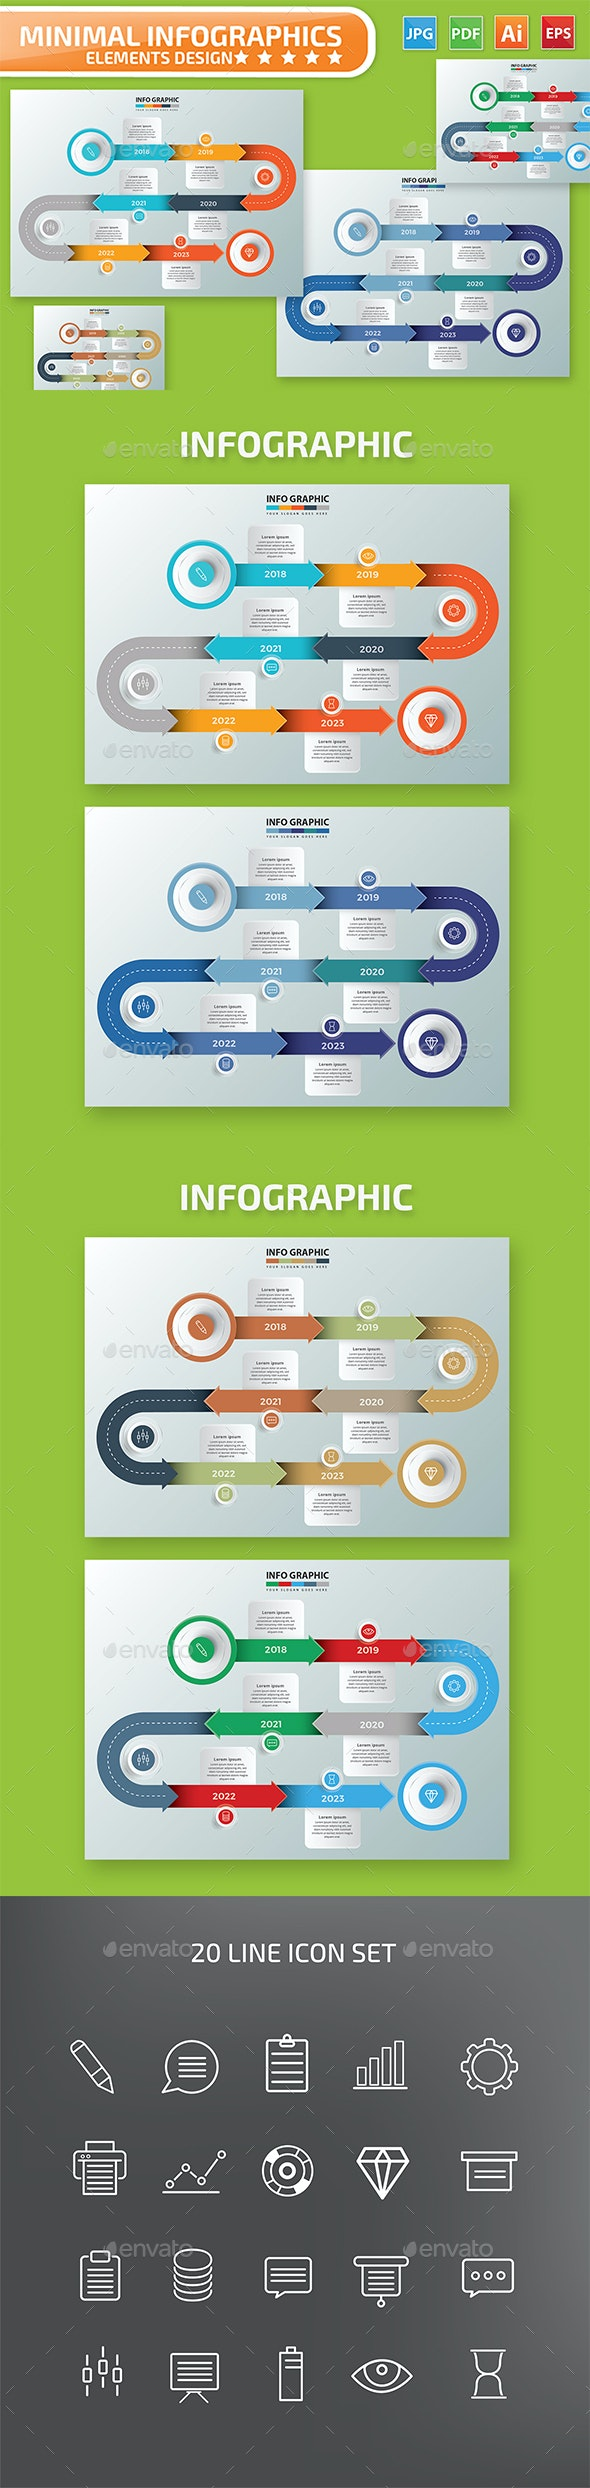 Timeline Infographic Design - Infographics